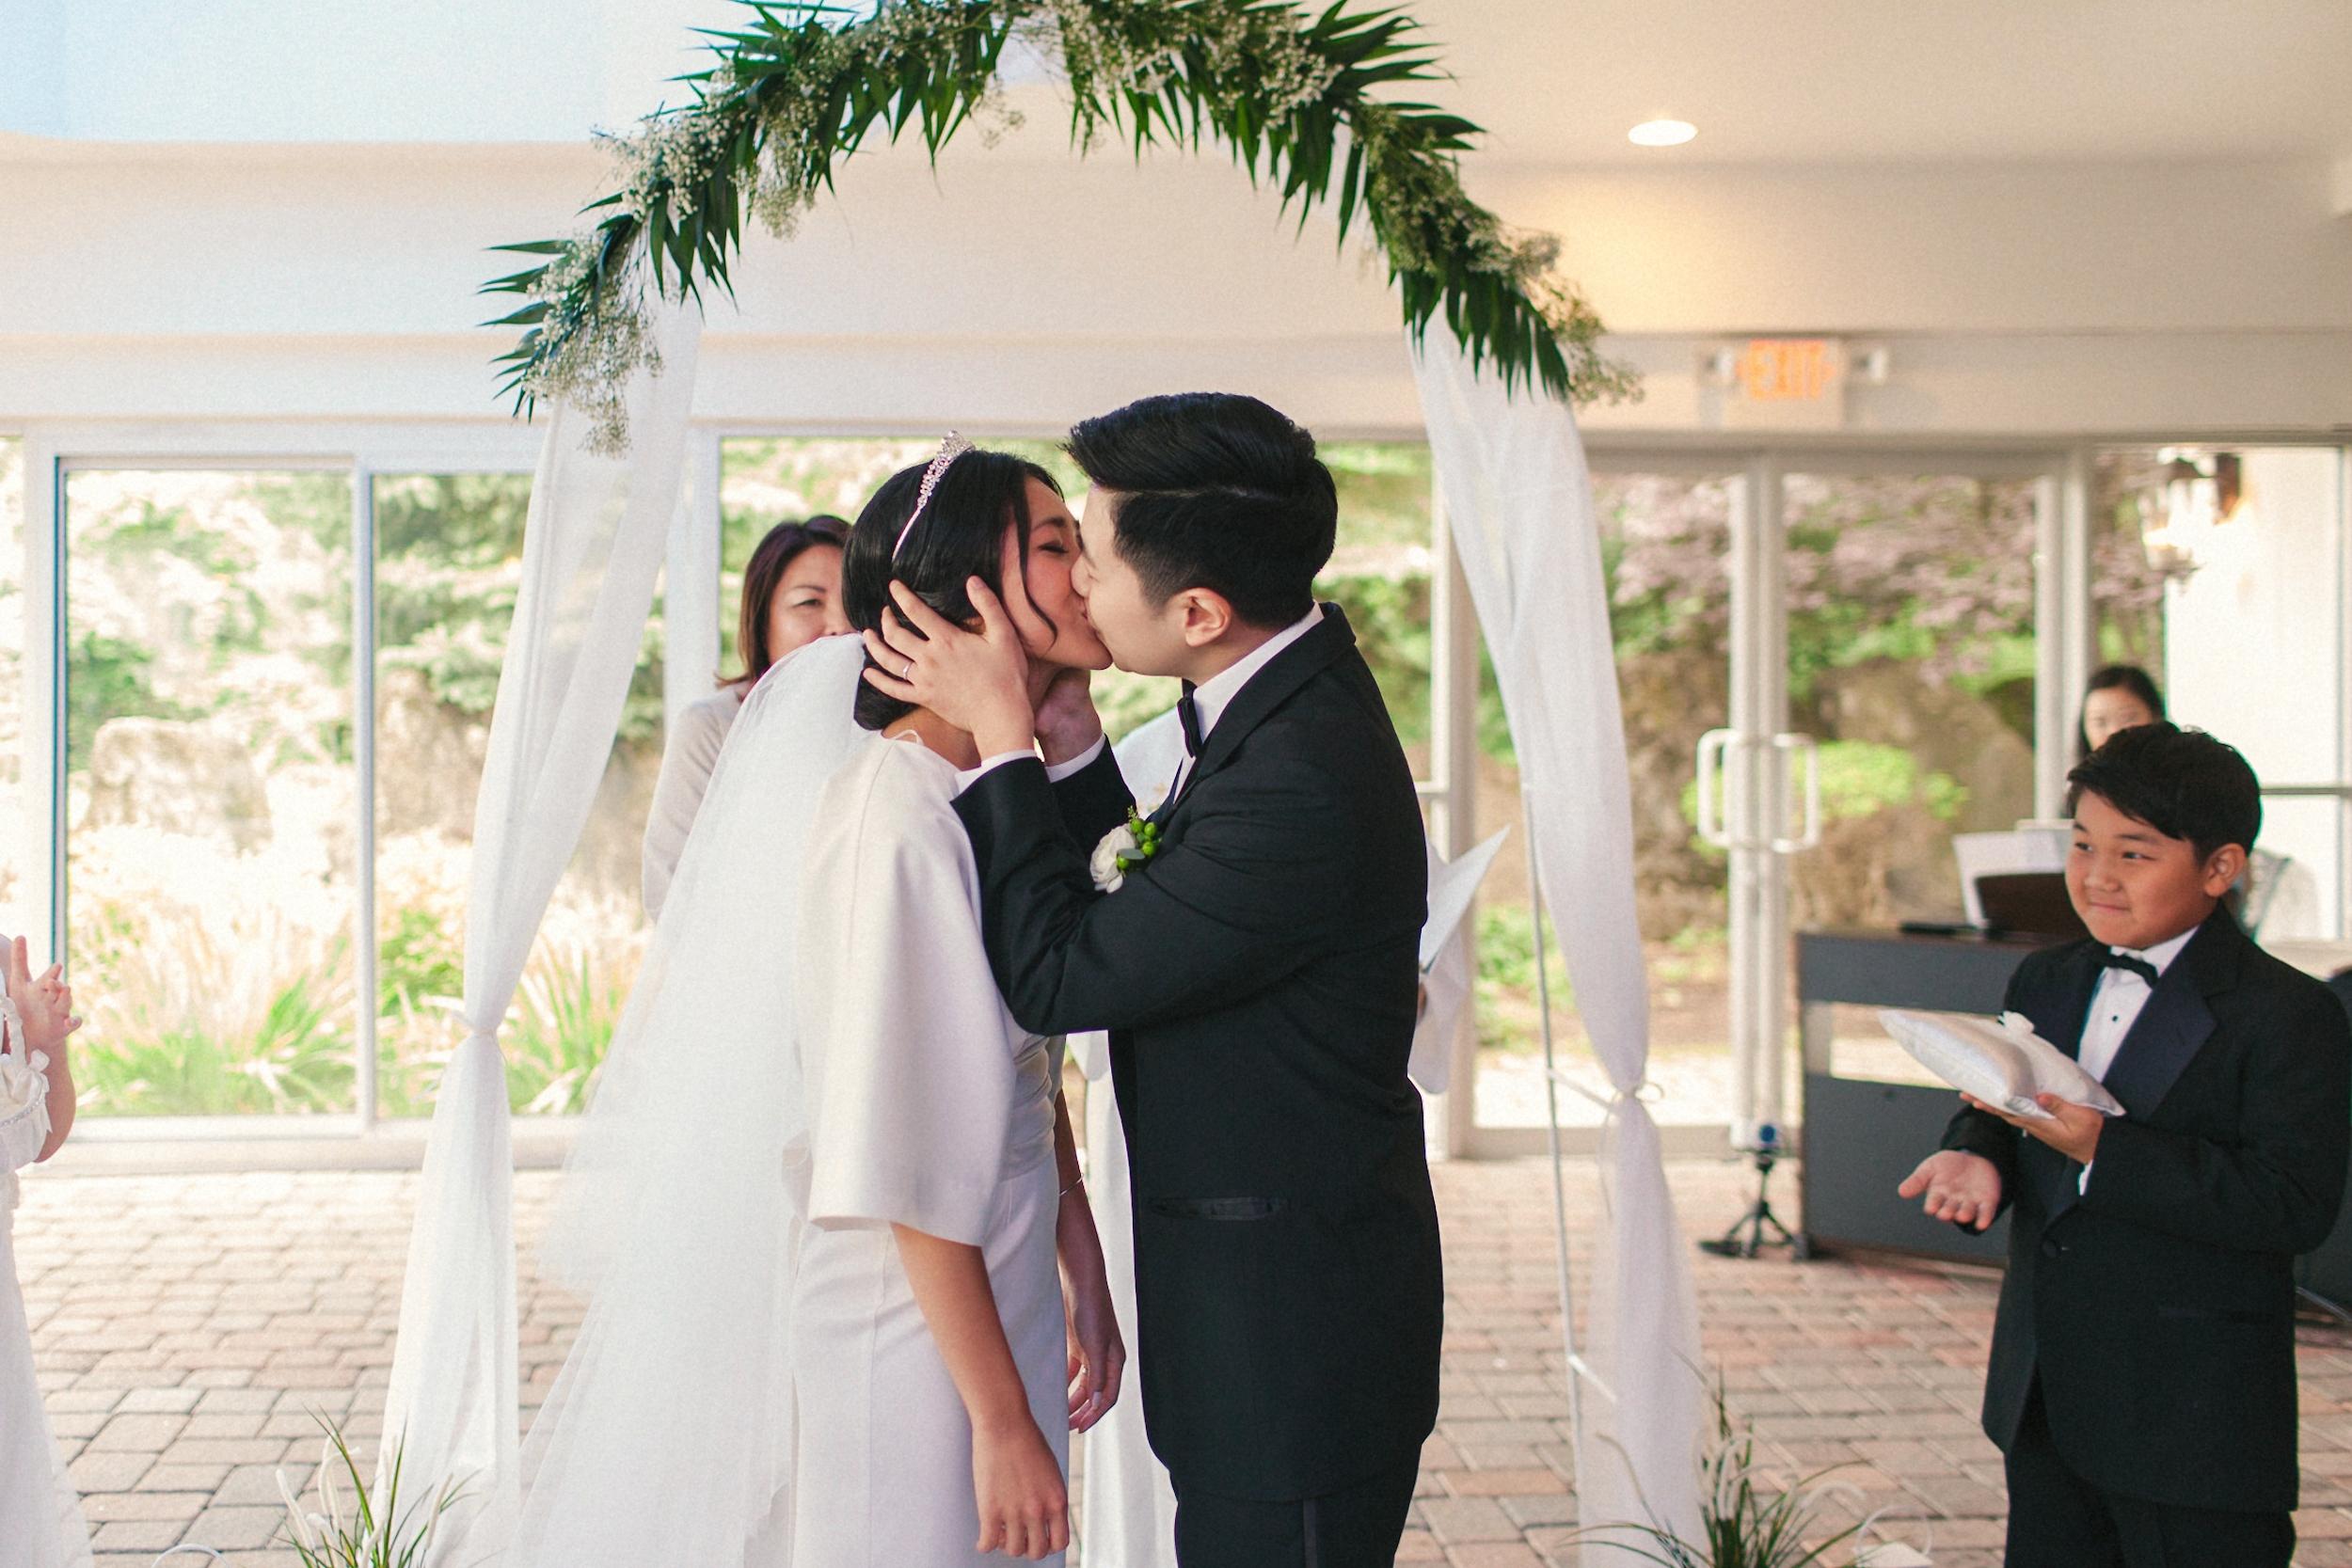 JEAN-ARNOLD-WEDDING-0342.jpg